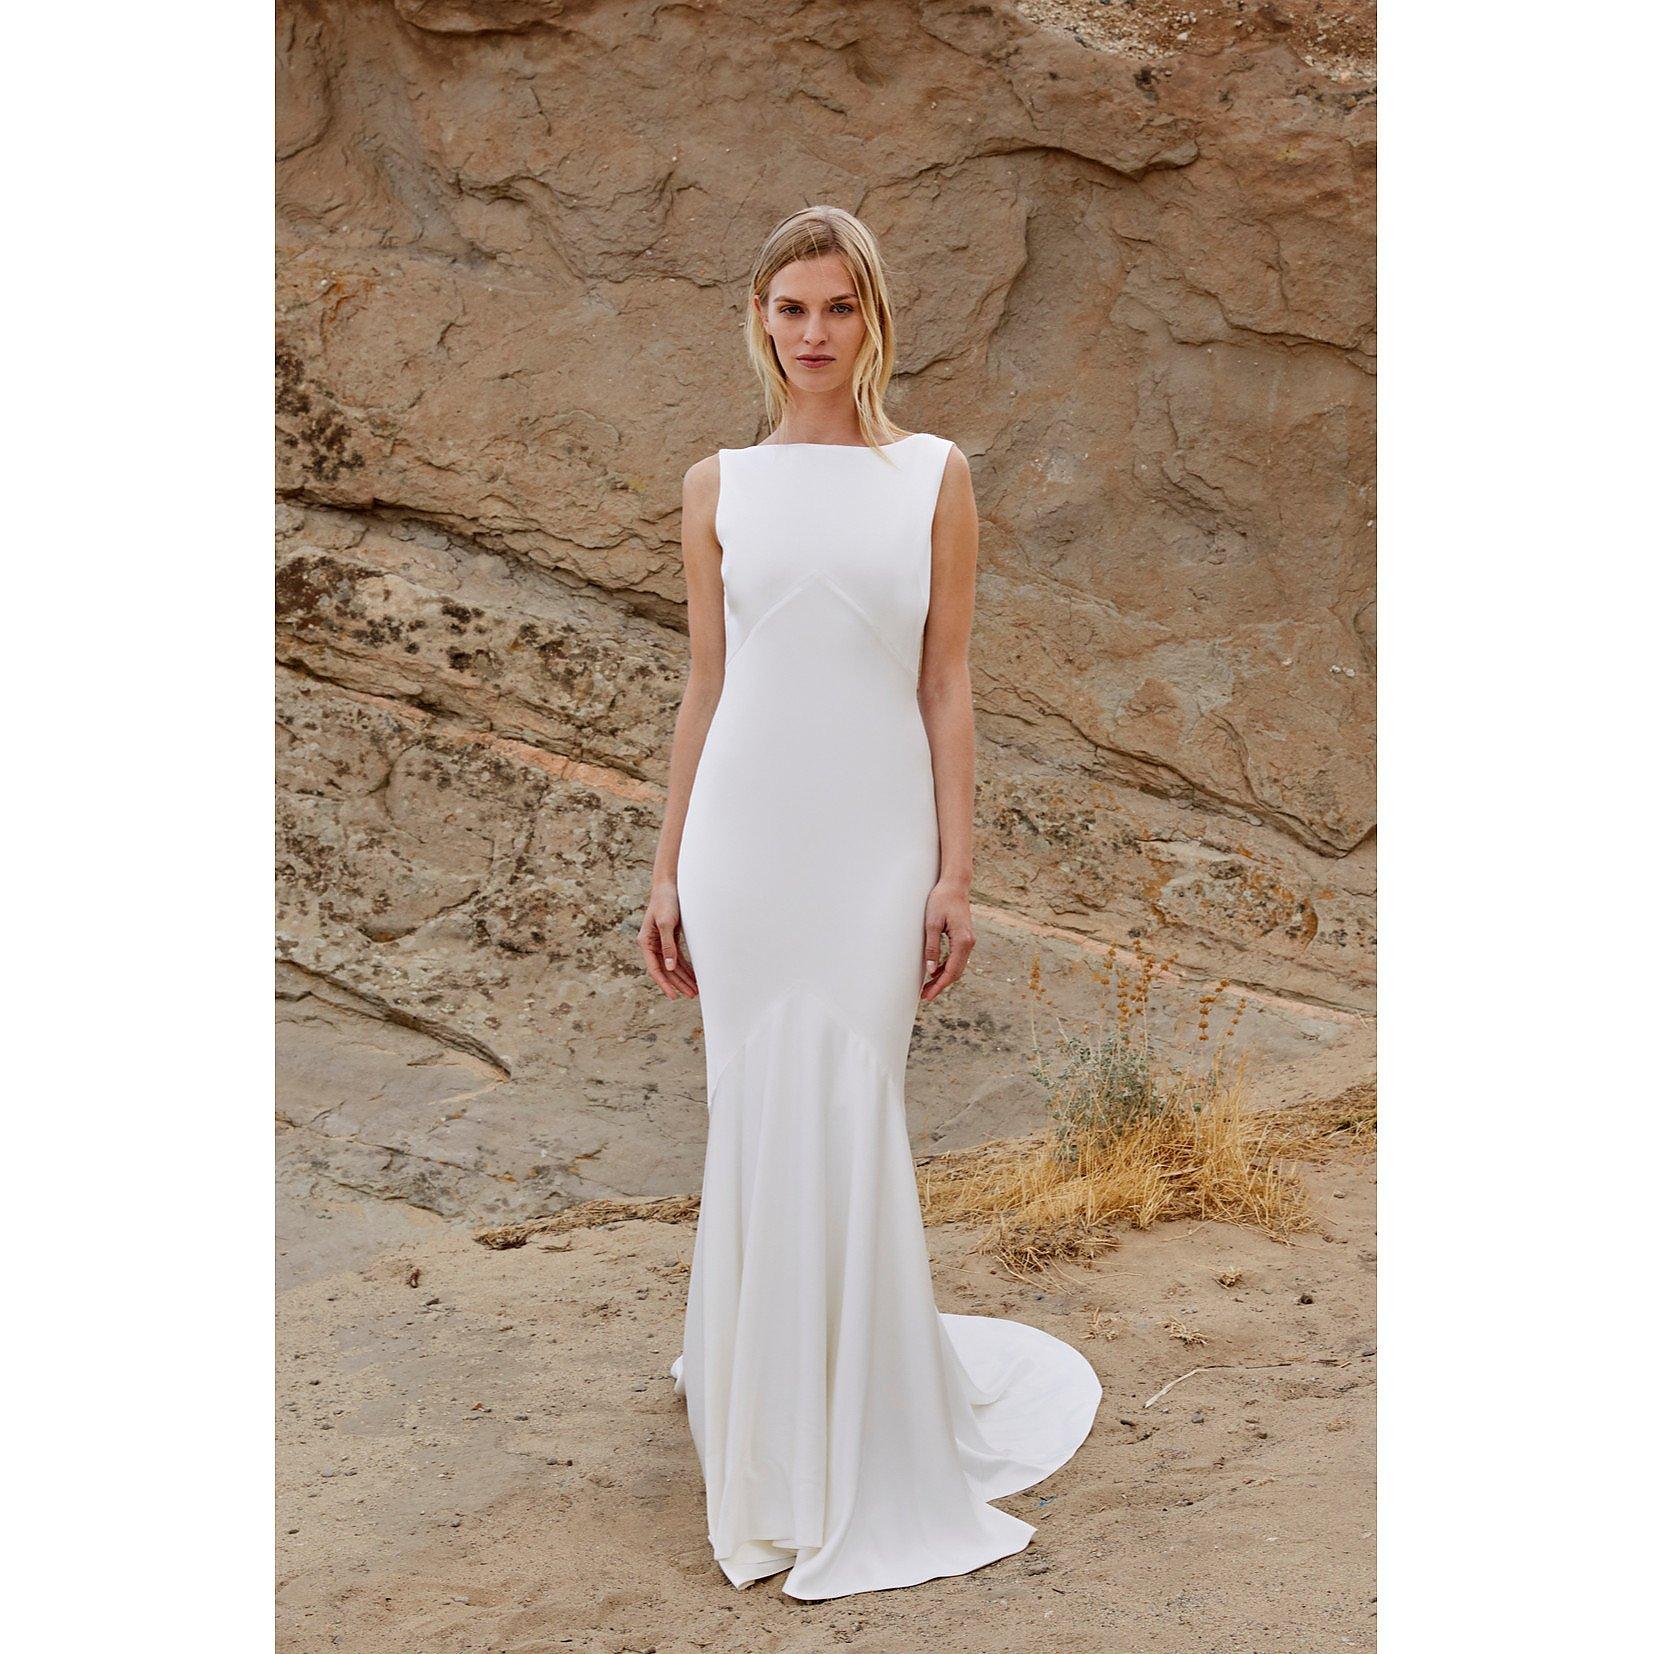 Savannah Miller Ottoline Bridal Dress